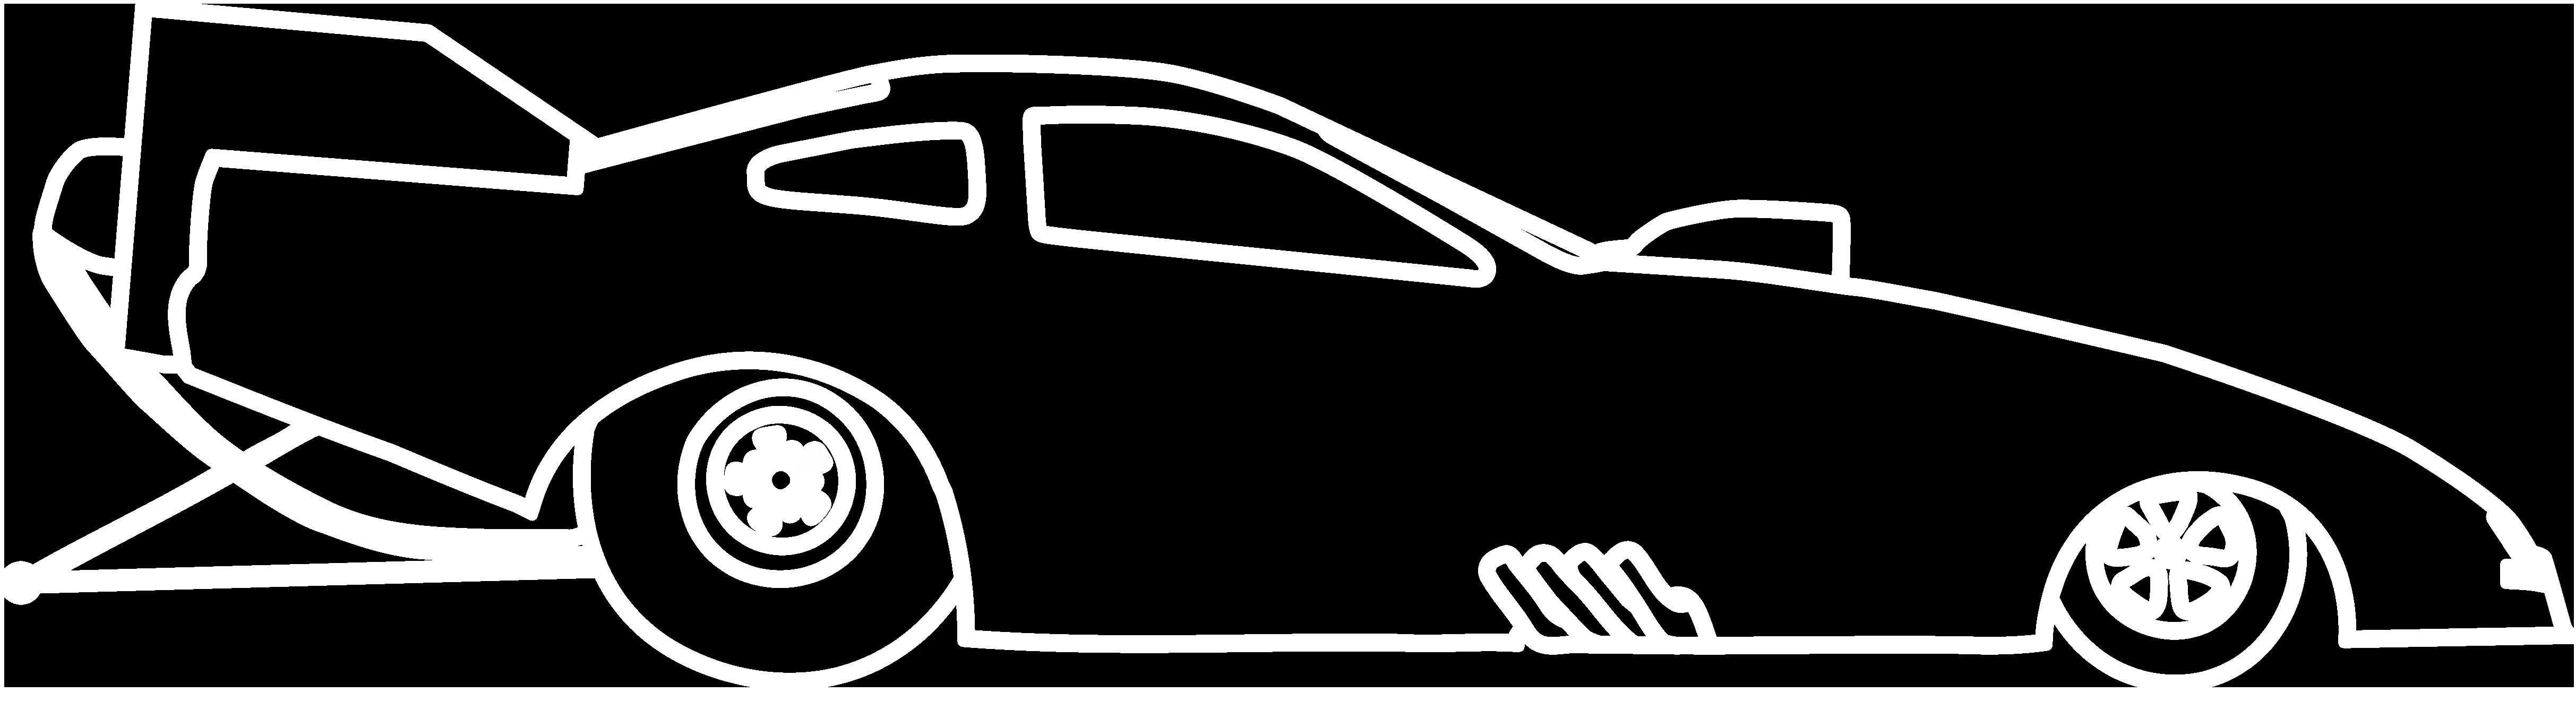 Karlsen Motorsport